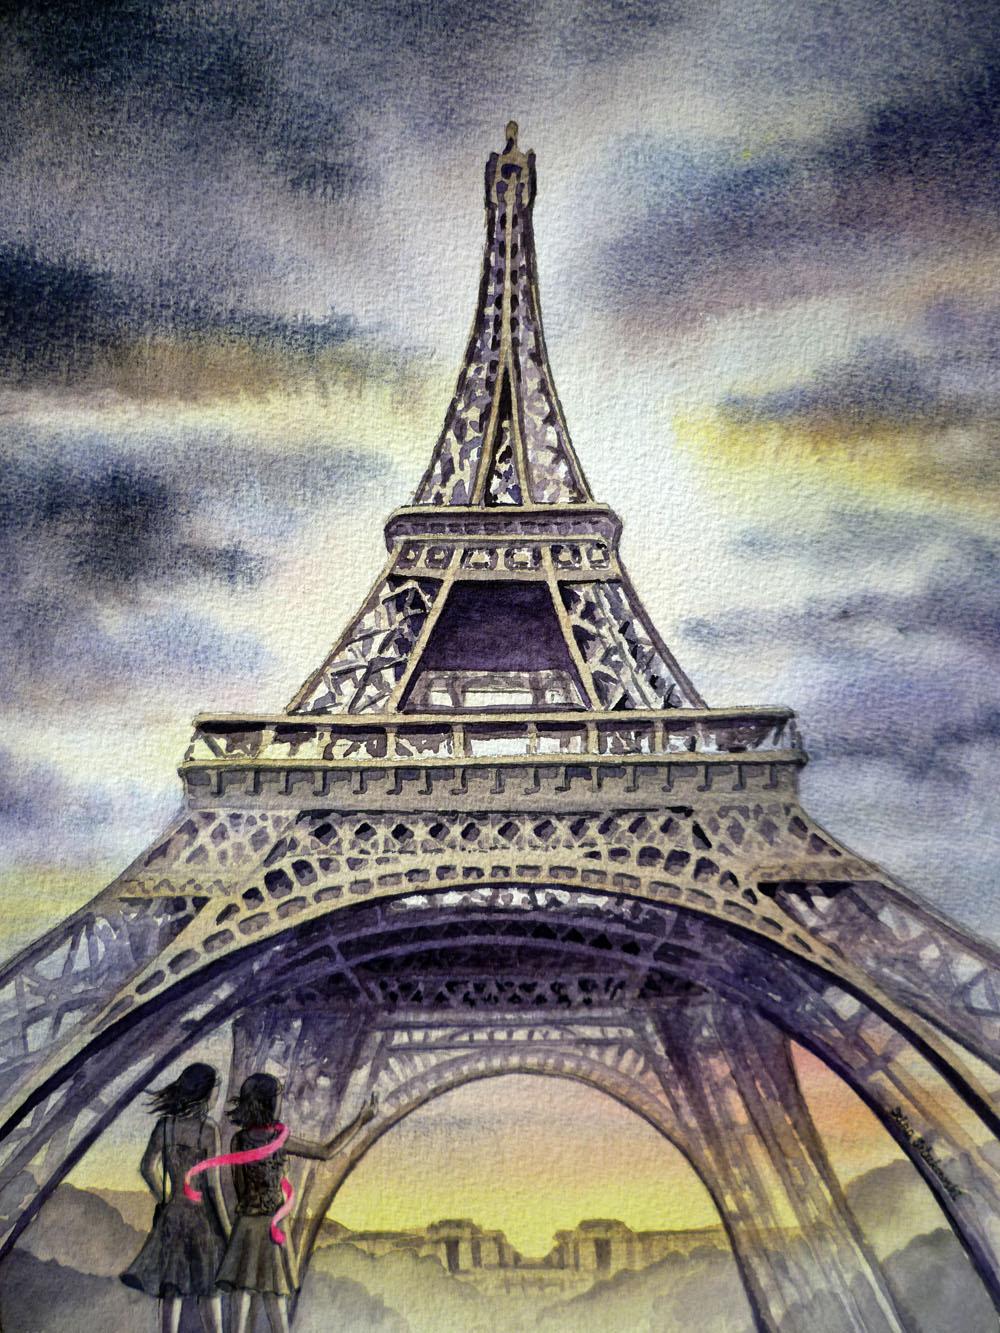 ------* SIEMPRE NOS QUEDARA PARIS *------ - Página 3 Paris_Eiffel_Tower__2012_1_Original